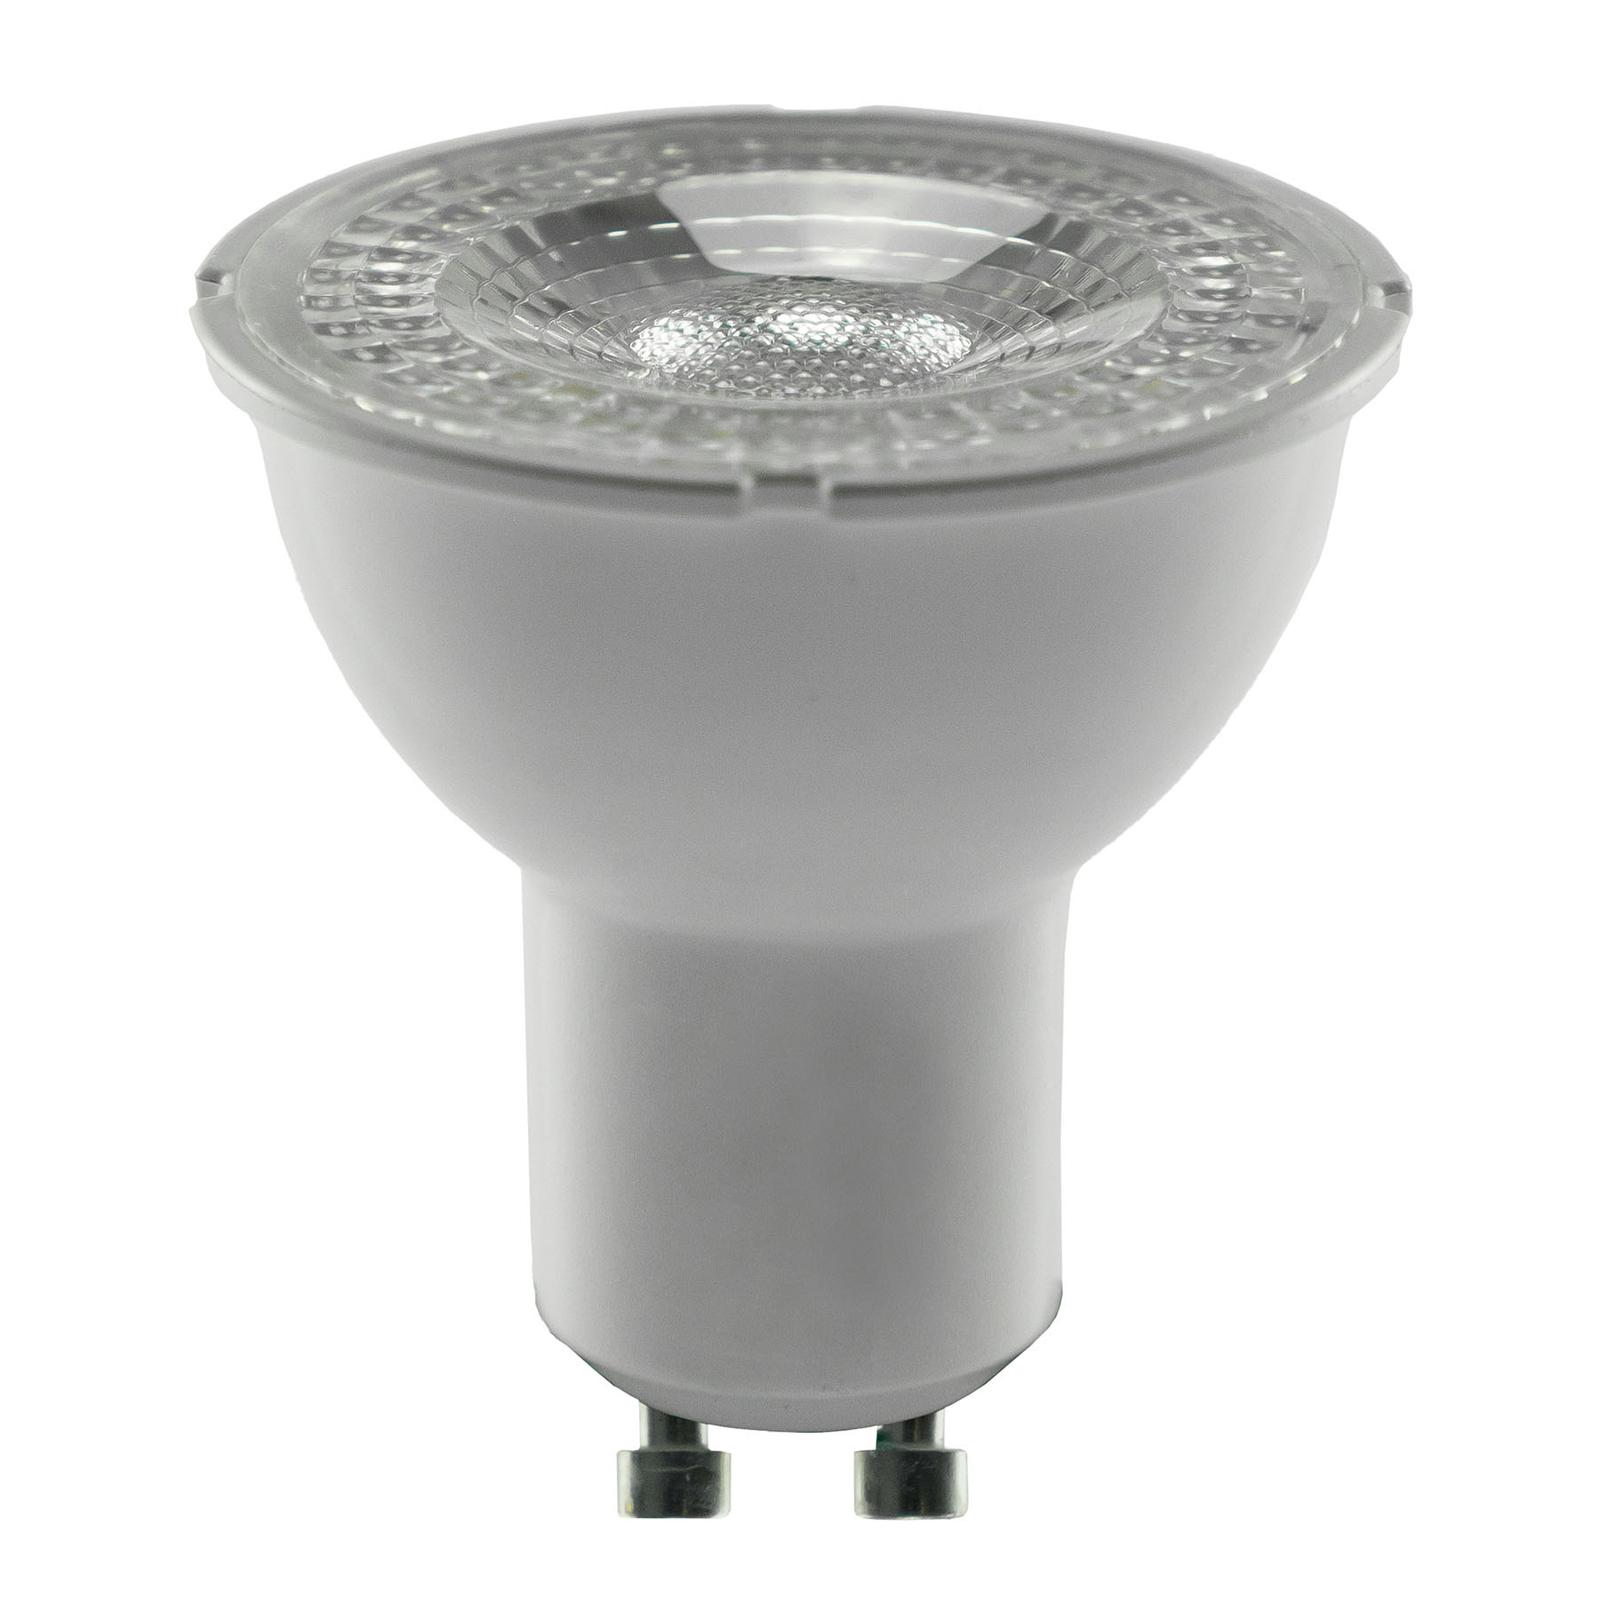 SEGULA LED-Reflektor GU10 6W 3.000K dimmbar 60°